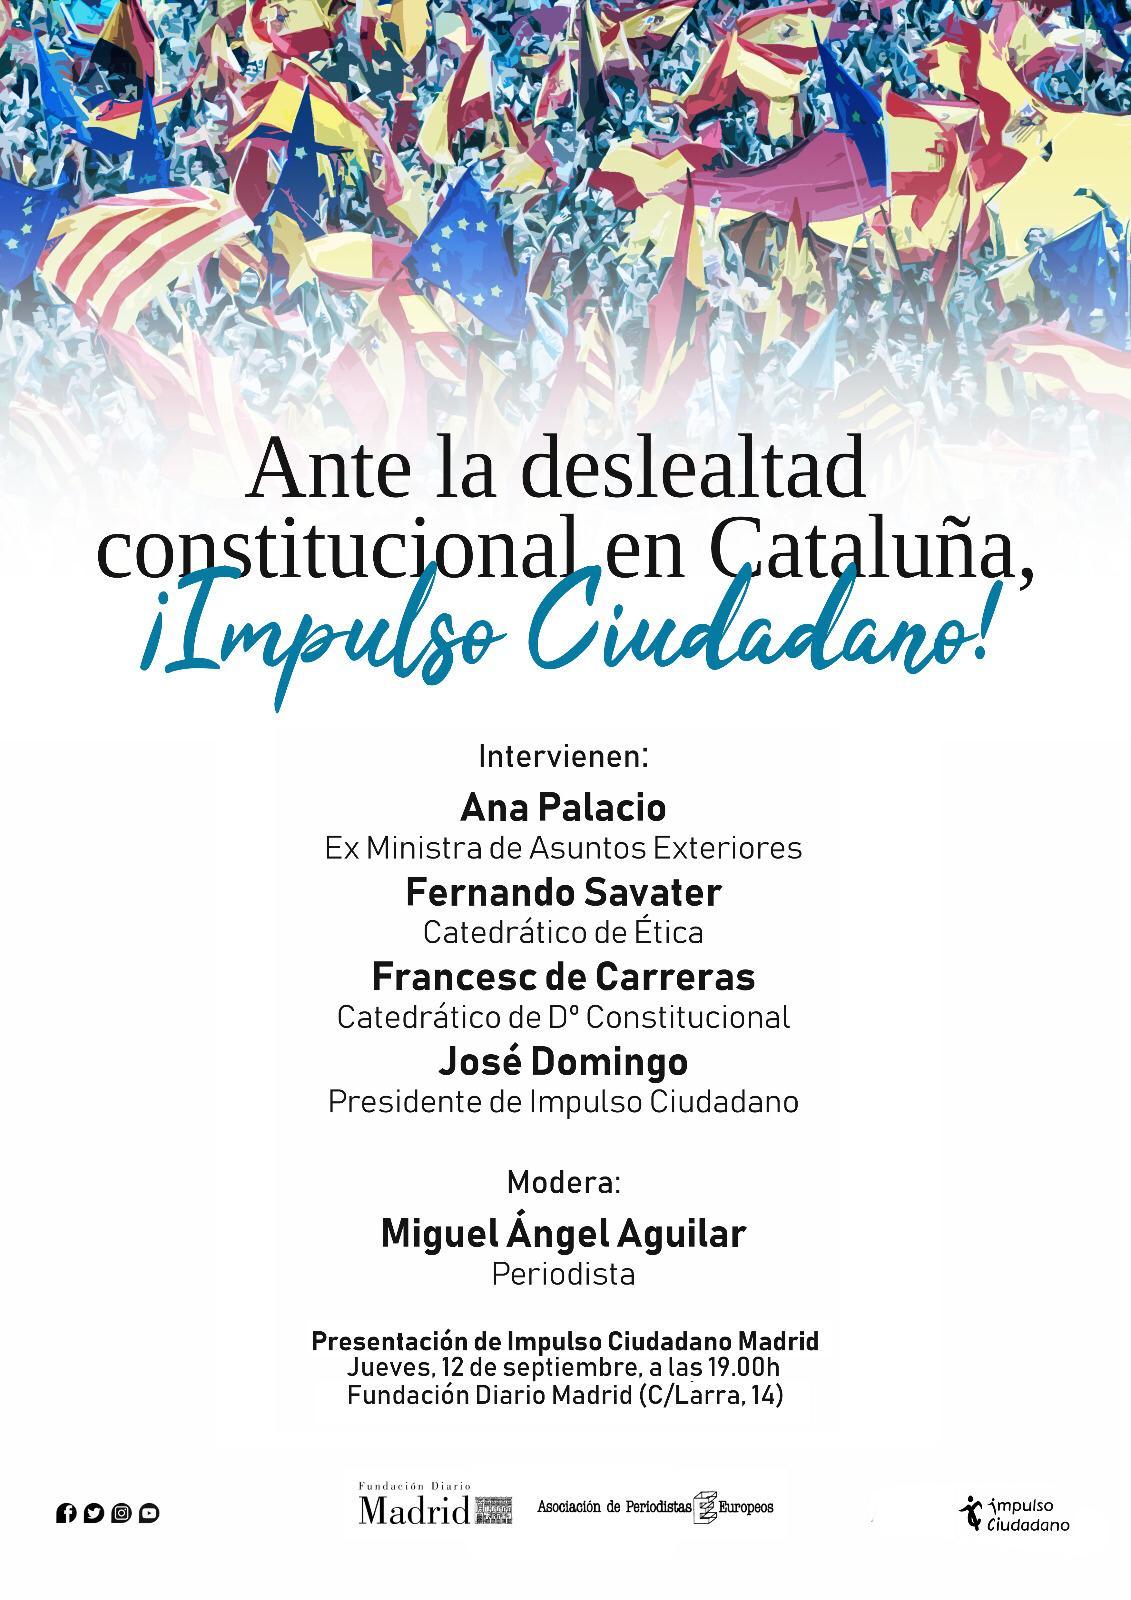 Cartel Presentacion Ic Madrid